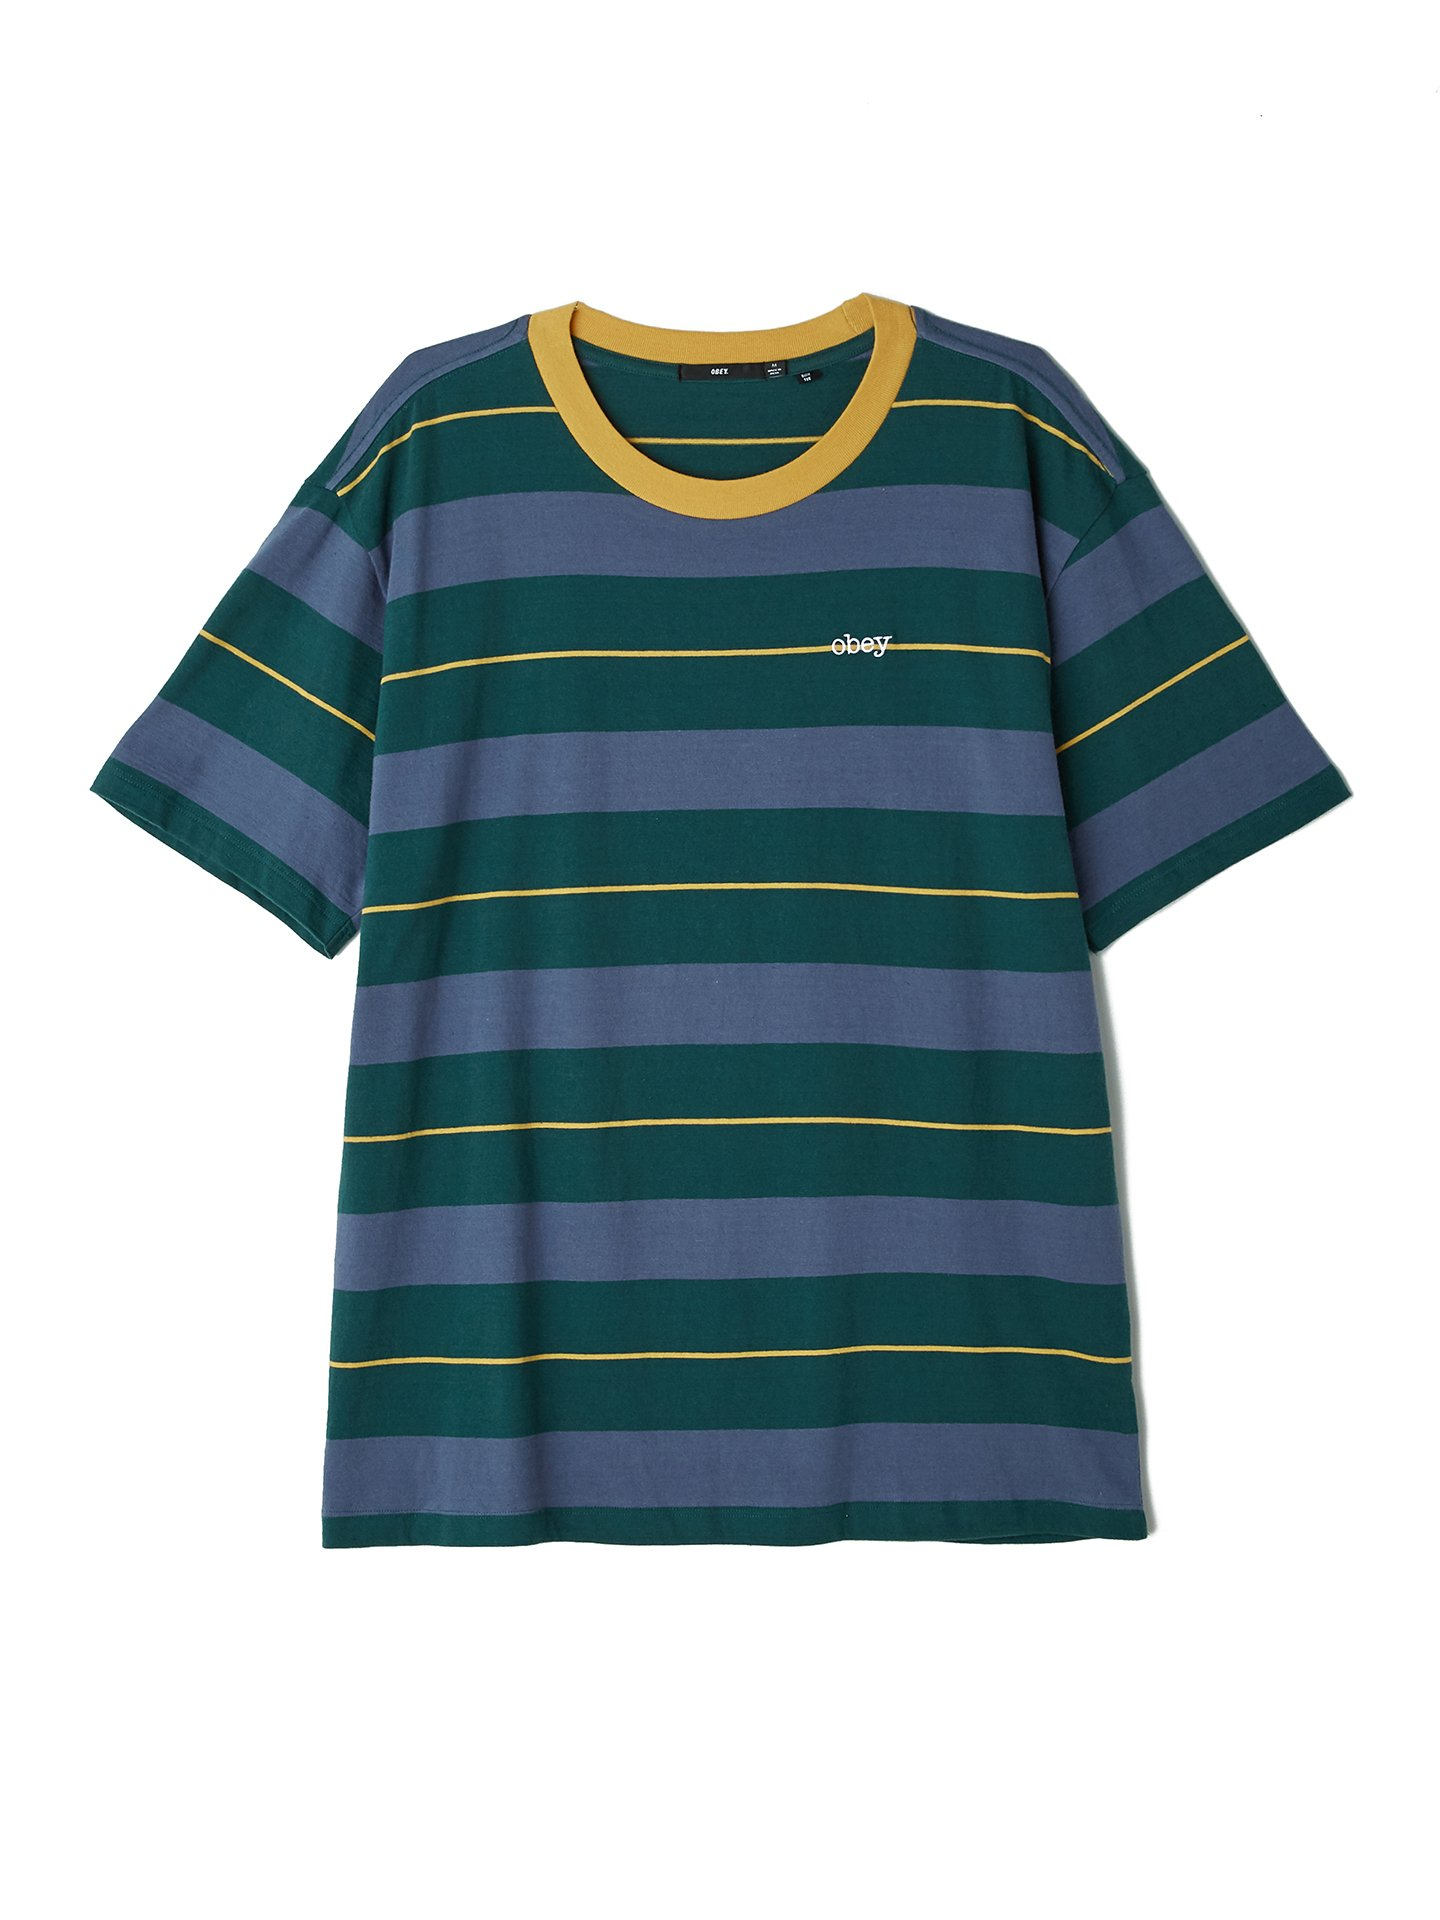 81631e4a41 Program Box T-Shirt - Obey Clothing UK